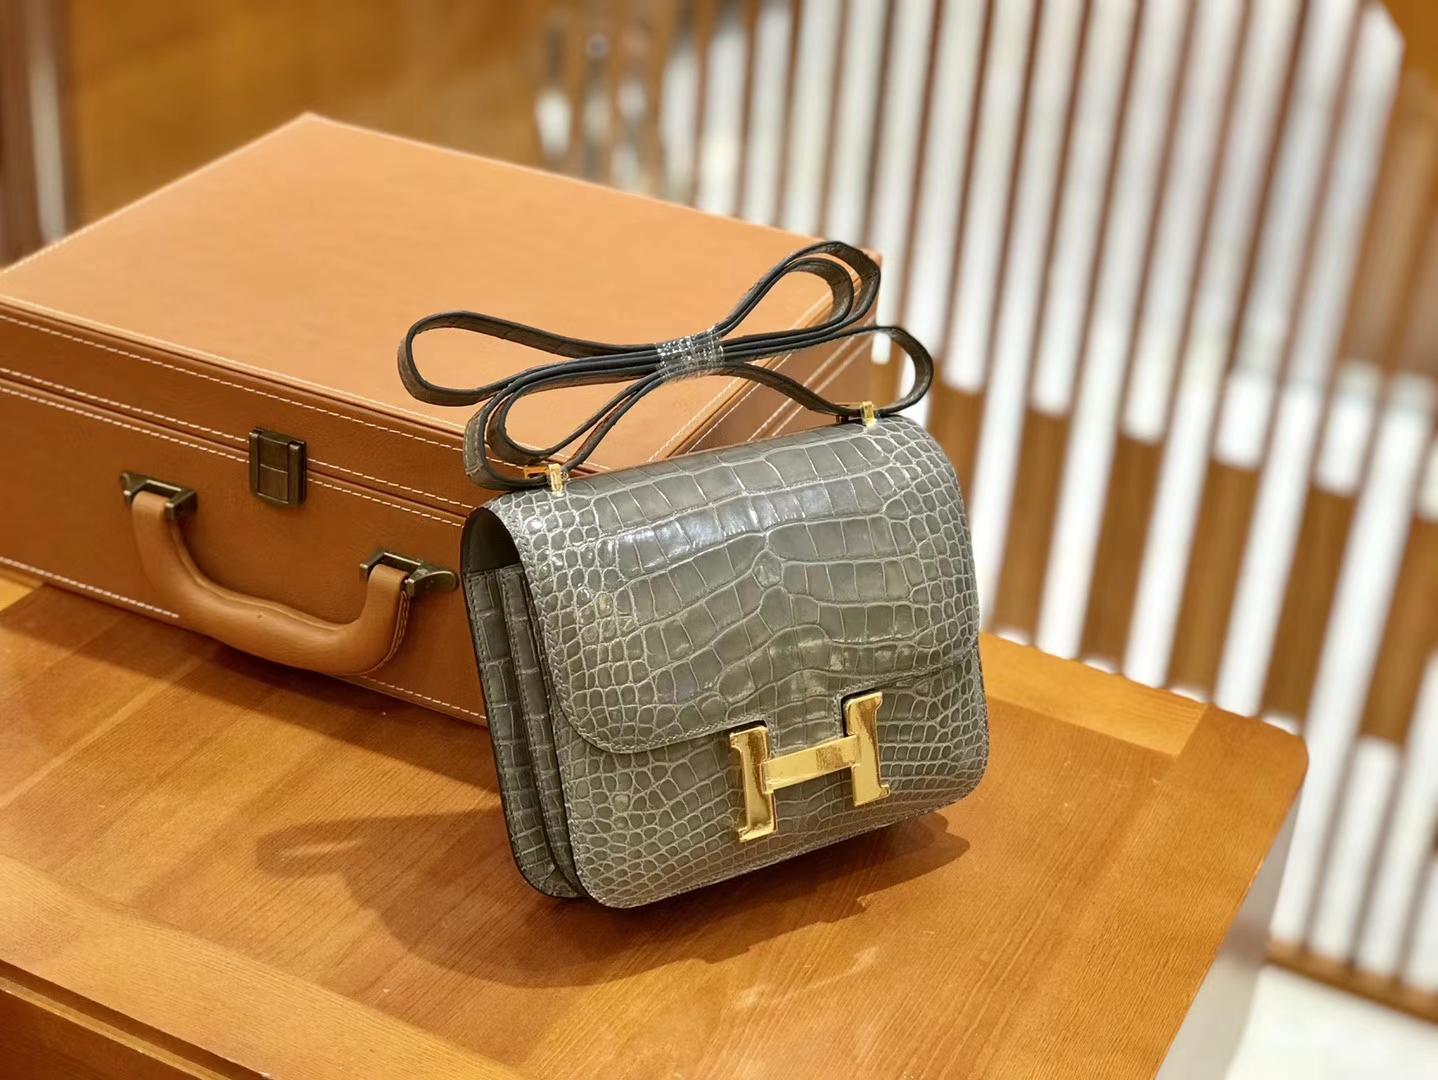 Hermès(爱马仕)Constance 18cm 美洲鳄鱼皮 斑鸠灰 金扣 全手工缝制 现货